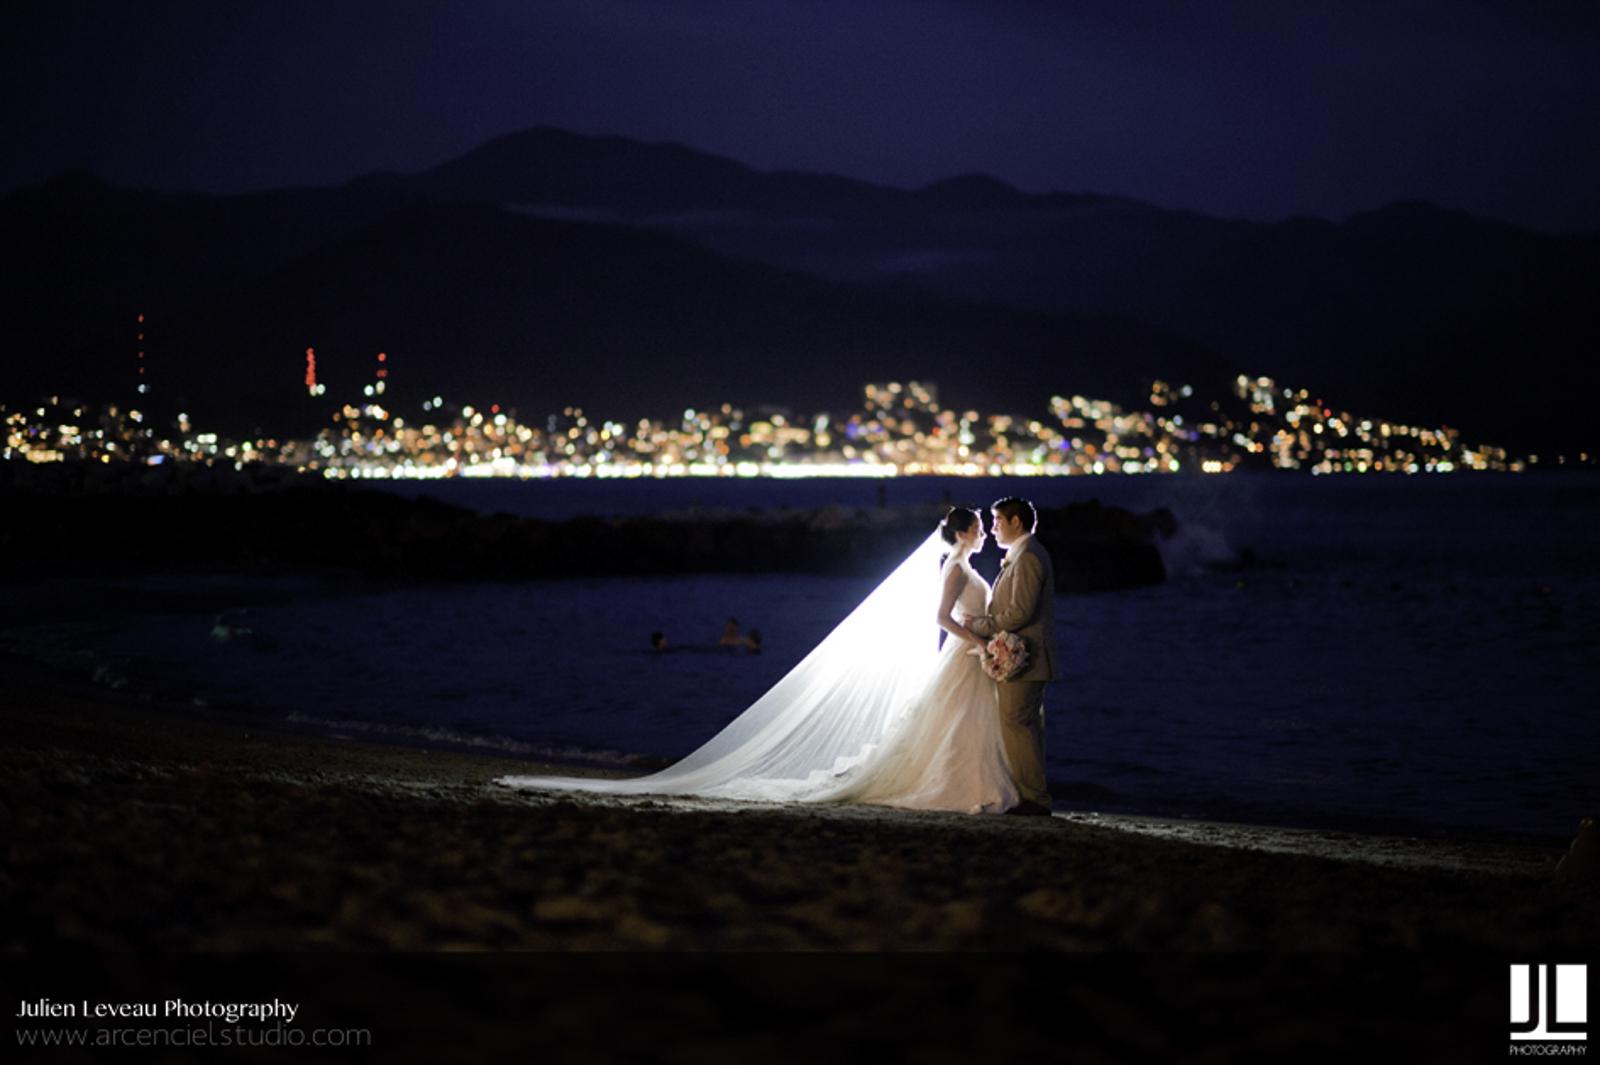 Wedding Photographer Puerto Vallarta - Professional photography by night